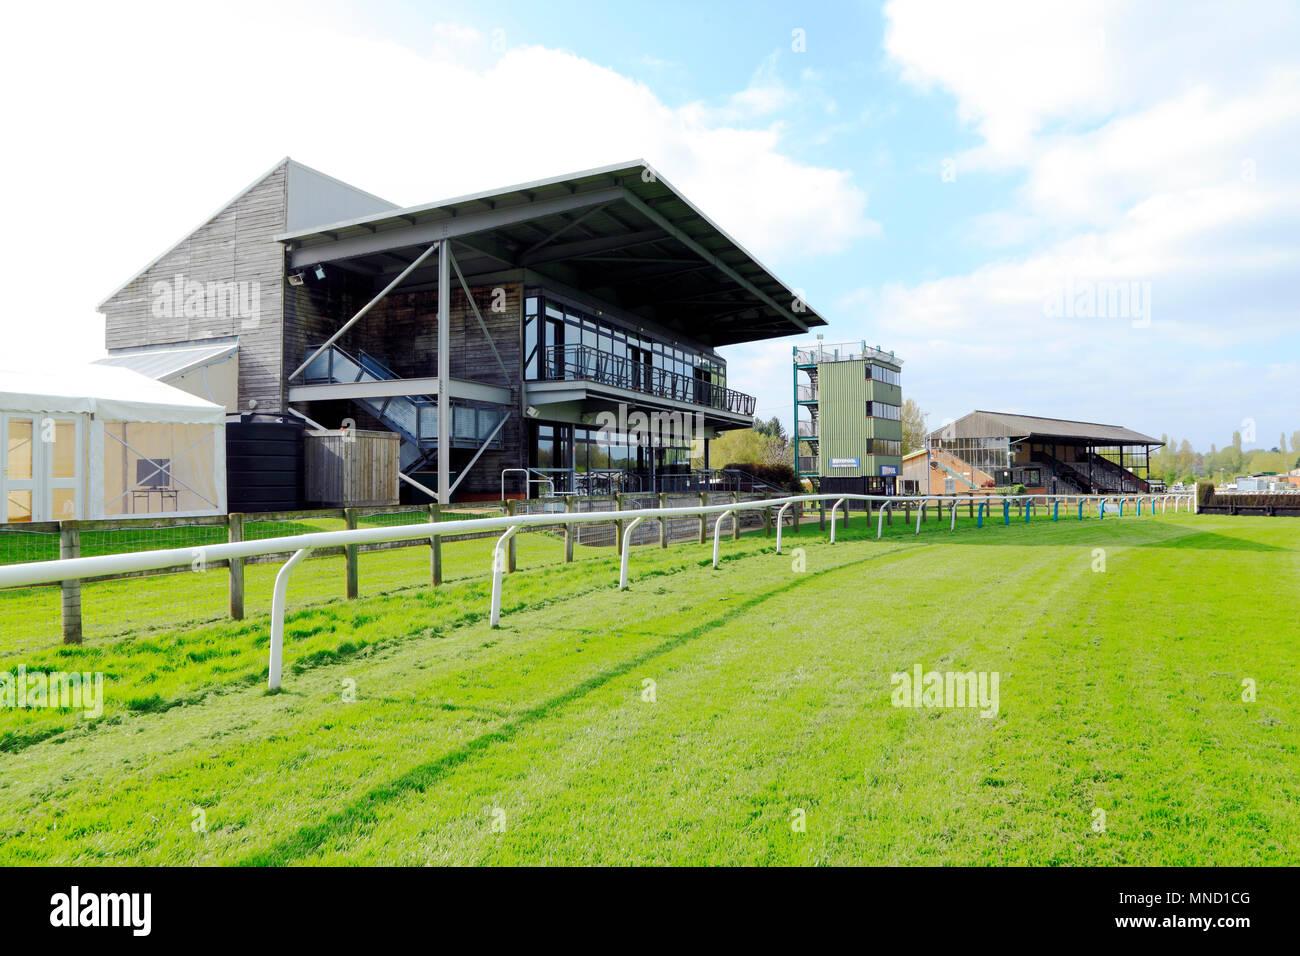 Fakenham Race Course, el área de visualización, tribuna, totepool, espectador gabinetes, Norfolk, Inglaterra, Reino Unido, carreras de caballos, pista, pistas, gradas Imagen De Stock